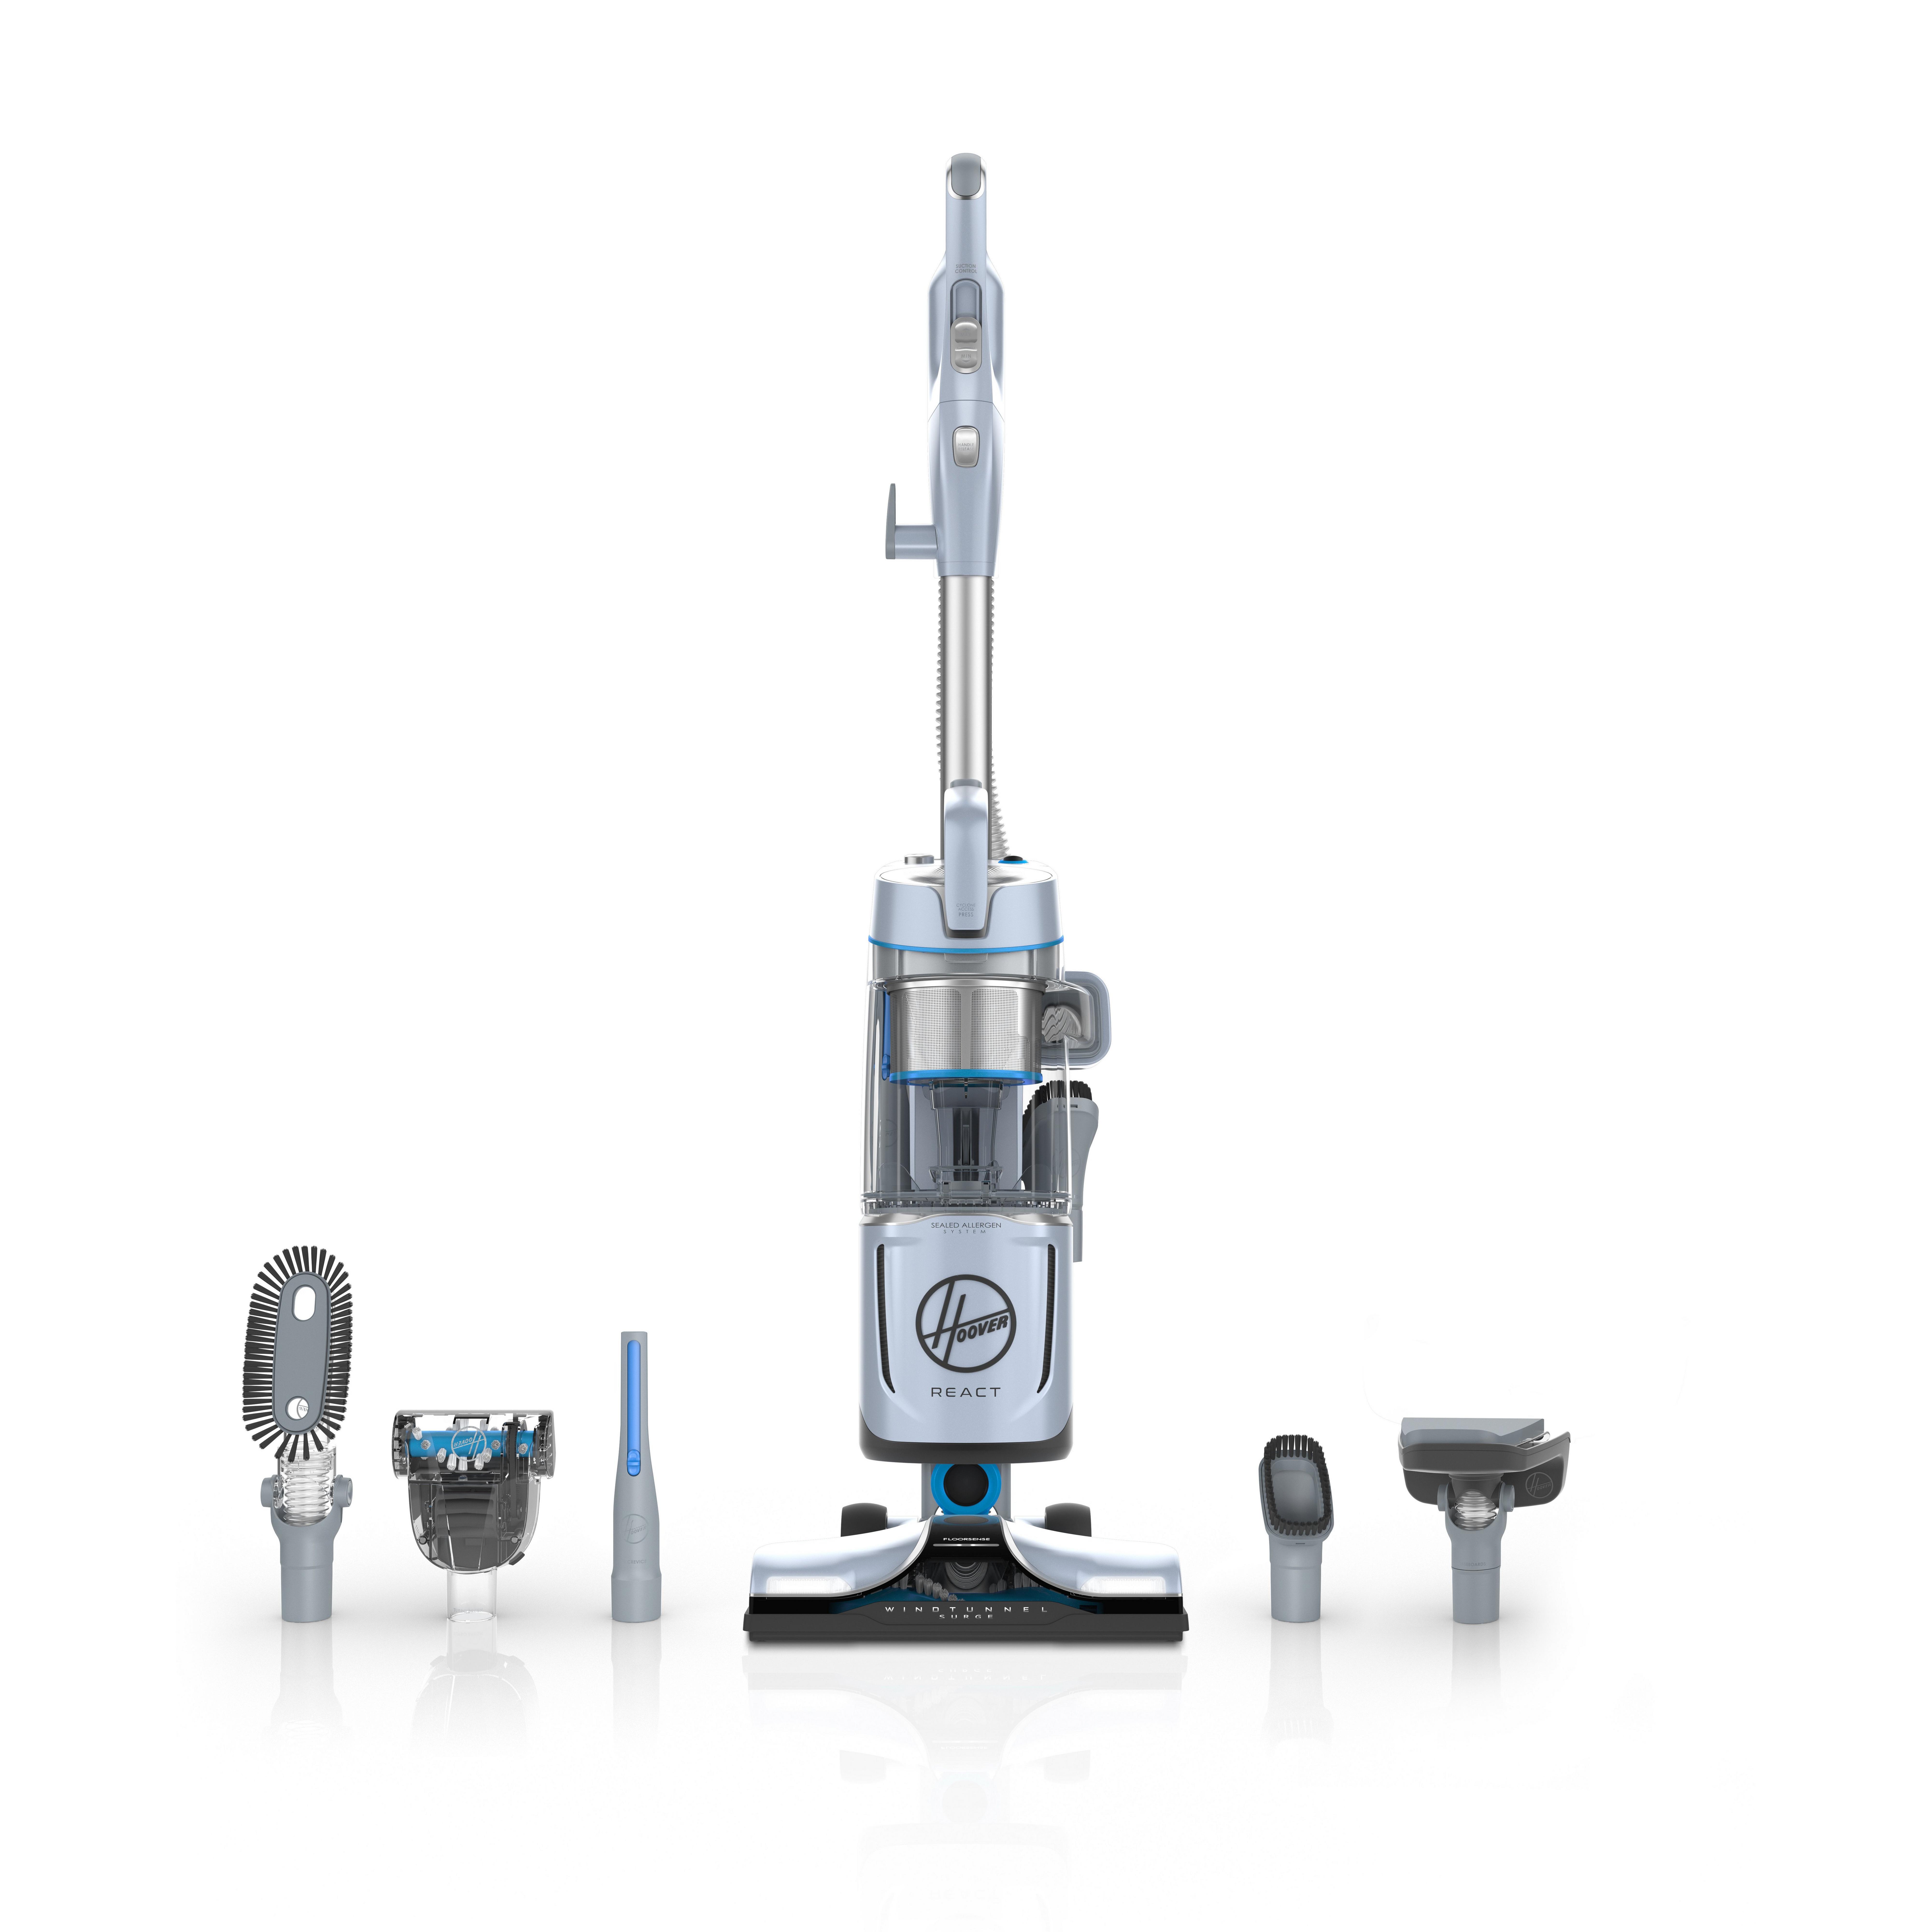 REACT QuickLift Deluxe Upright Vacuum